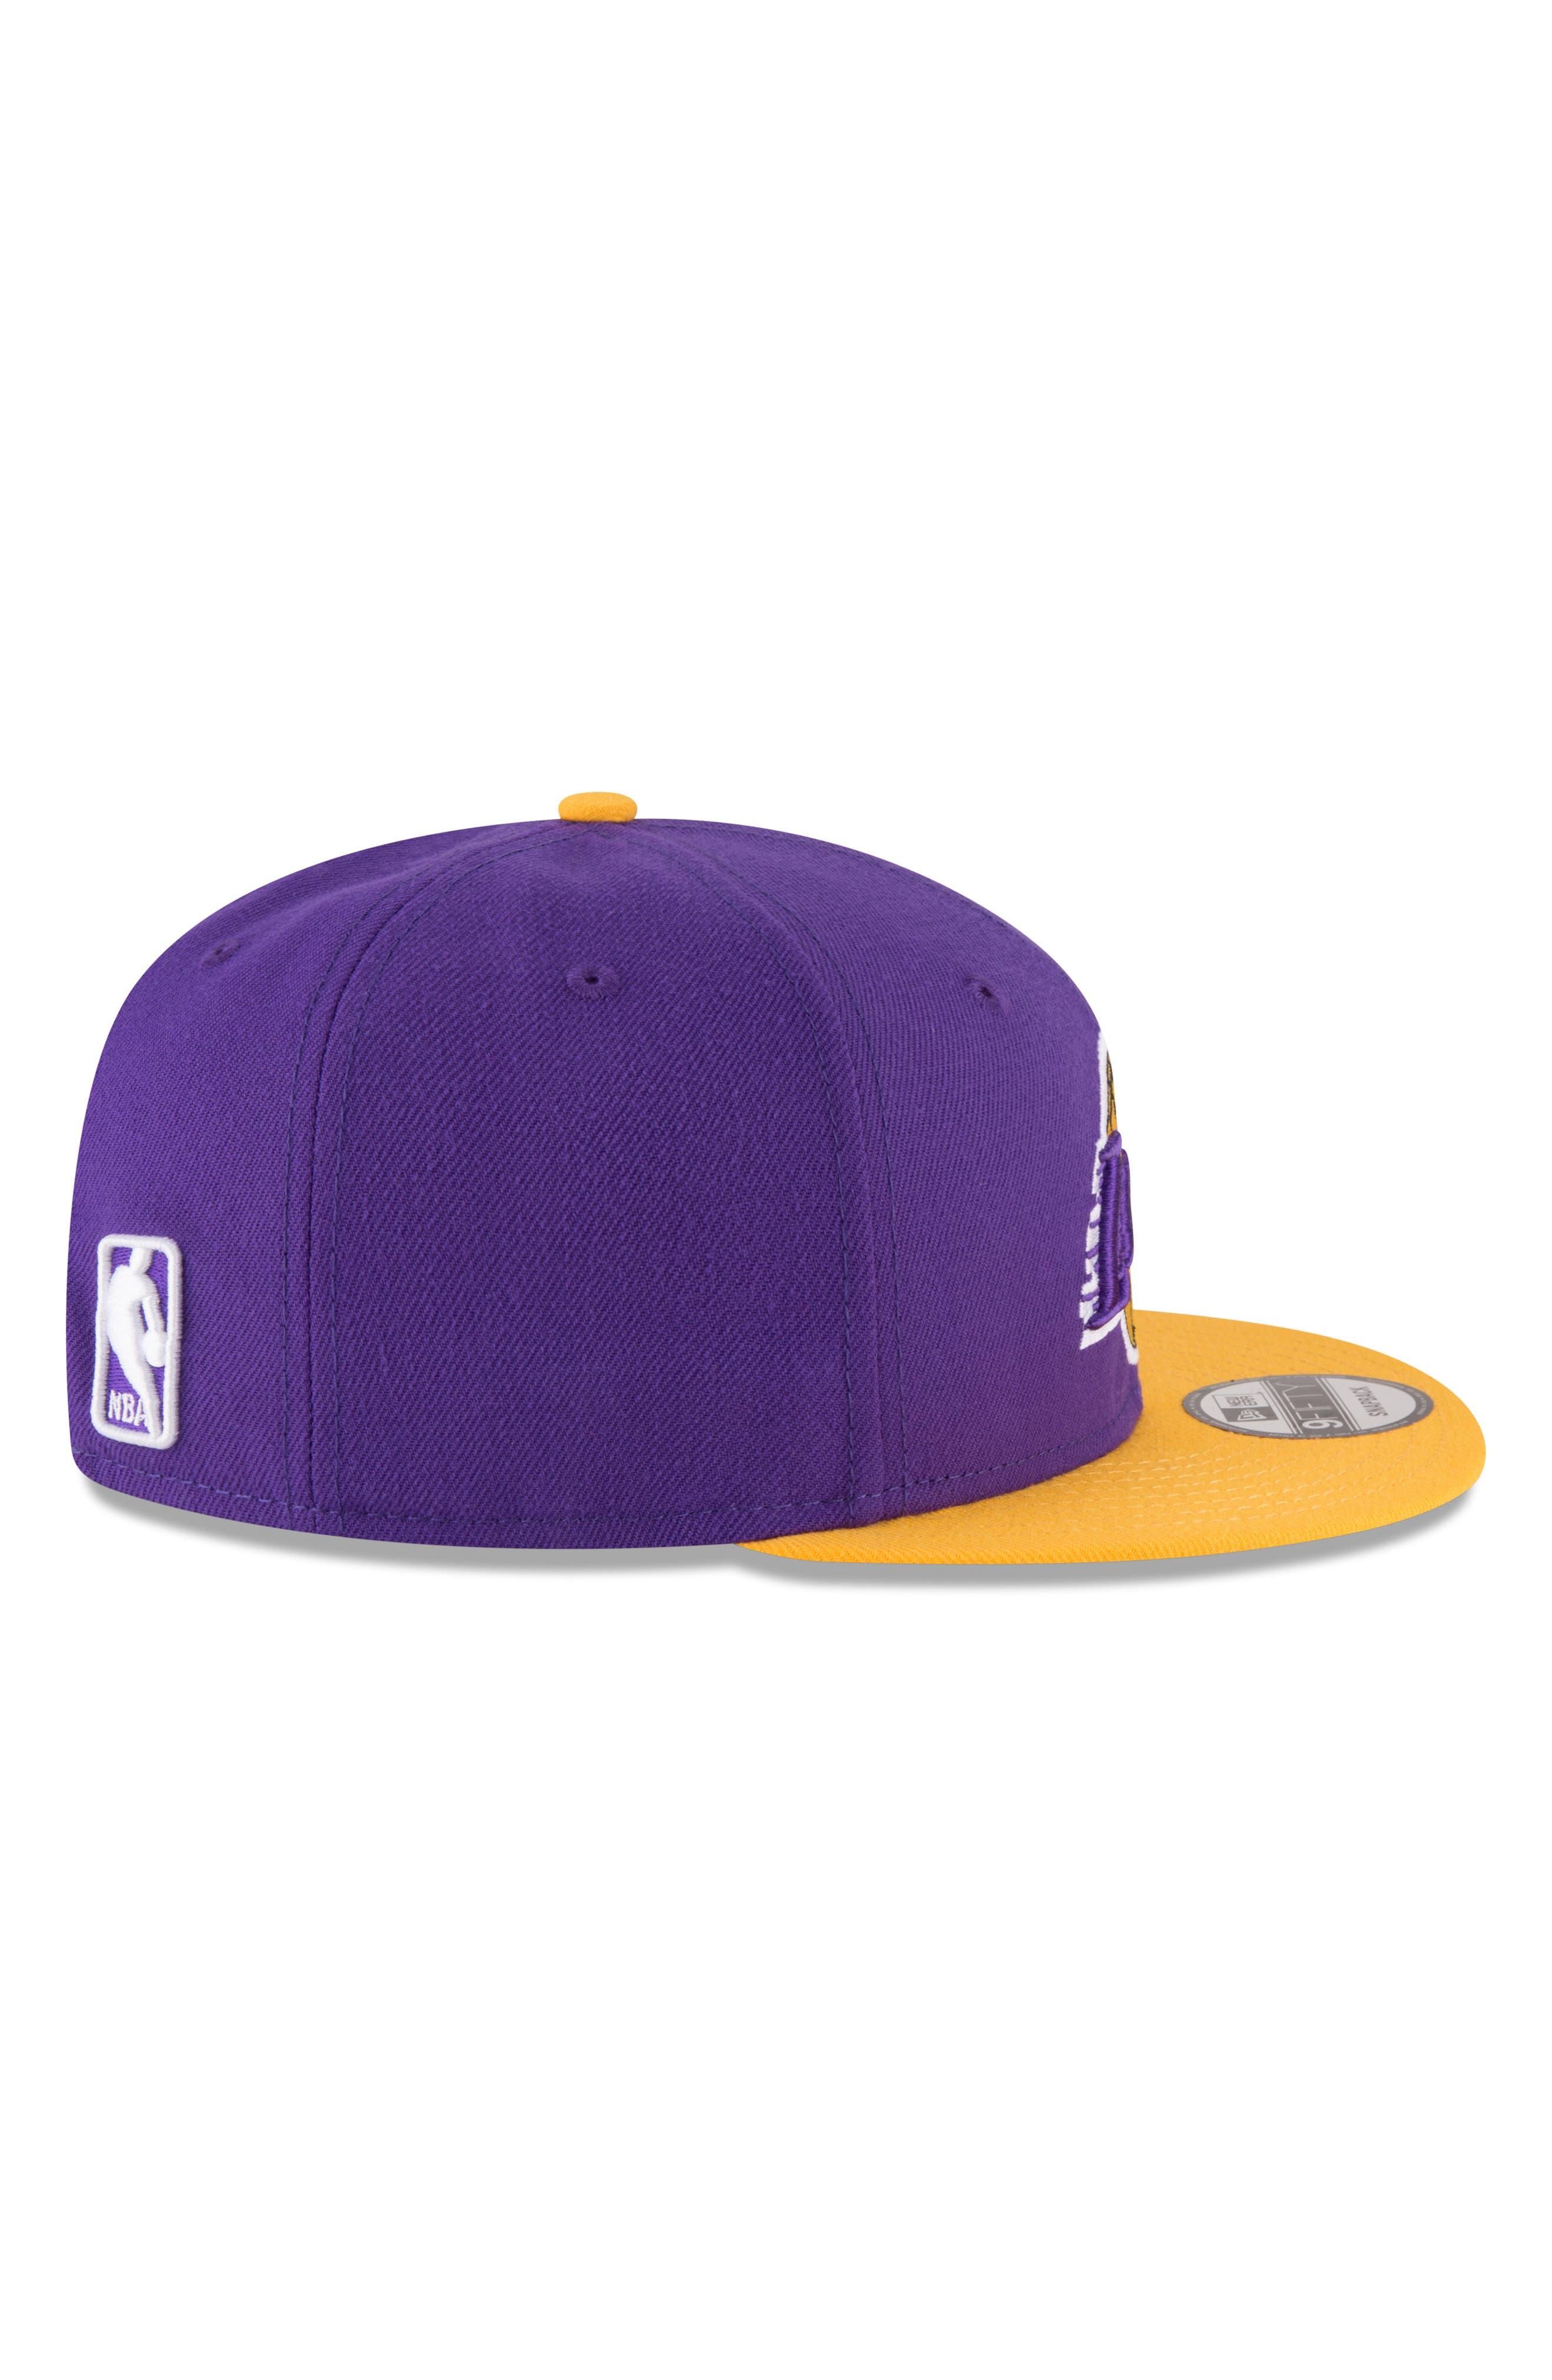 9FIFTY LA Lakers Two-Tone Cap,                             Alternate thumbnail 2, color,                             PURPLE